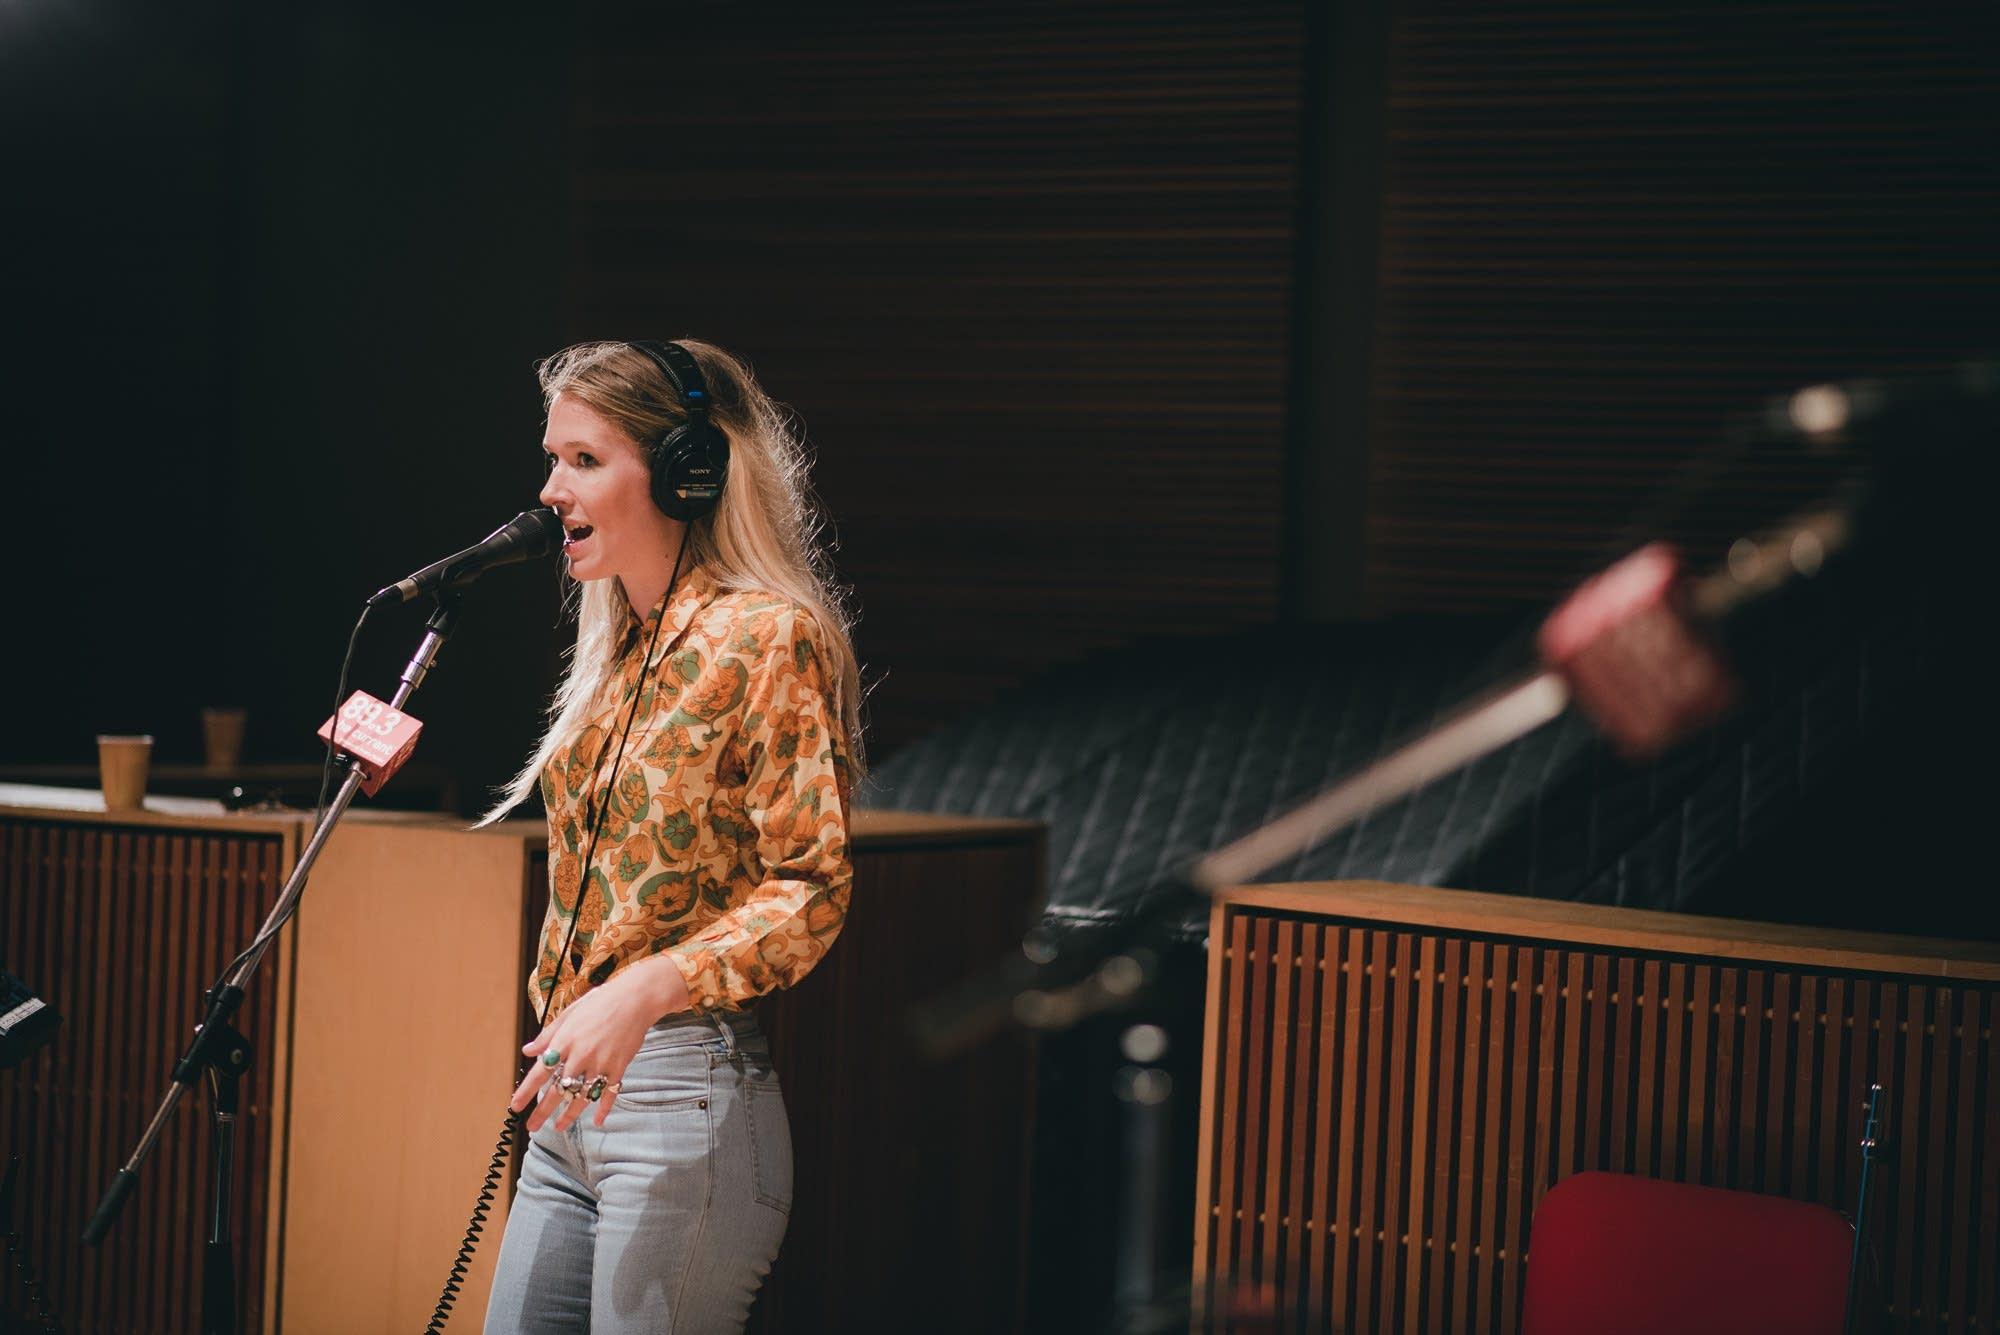 Natalie Bergman